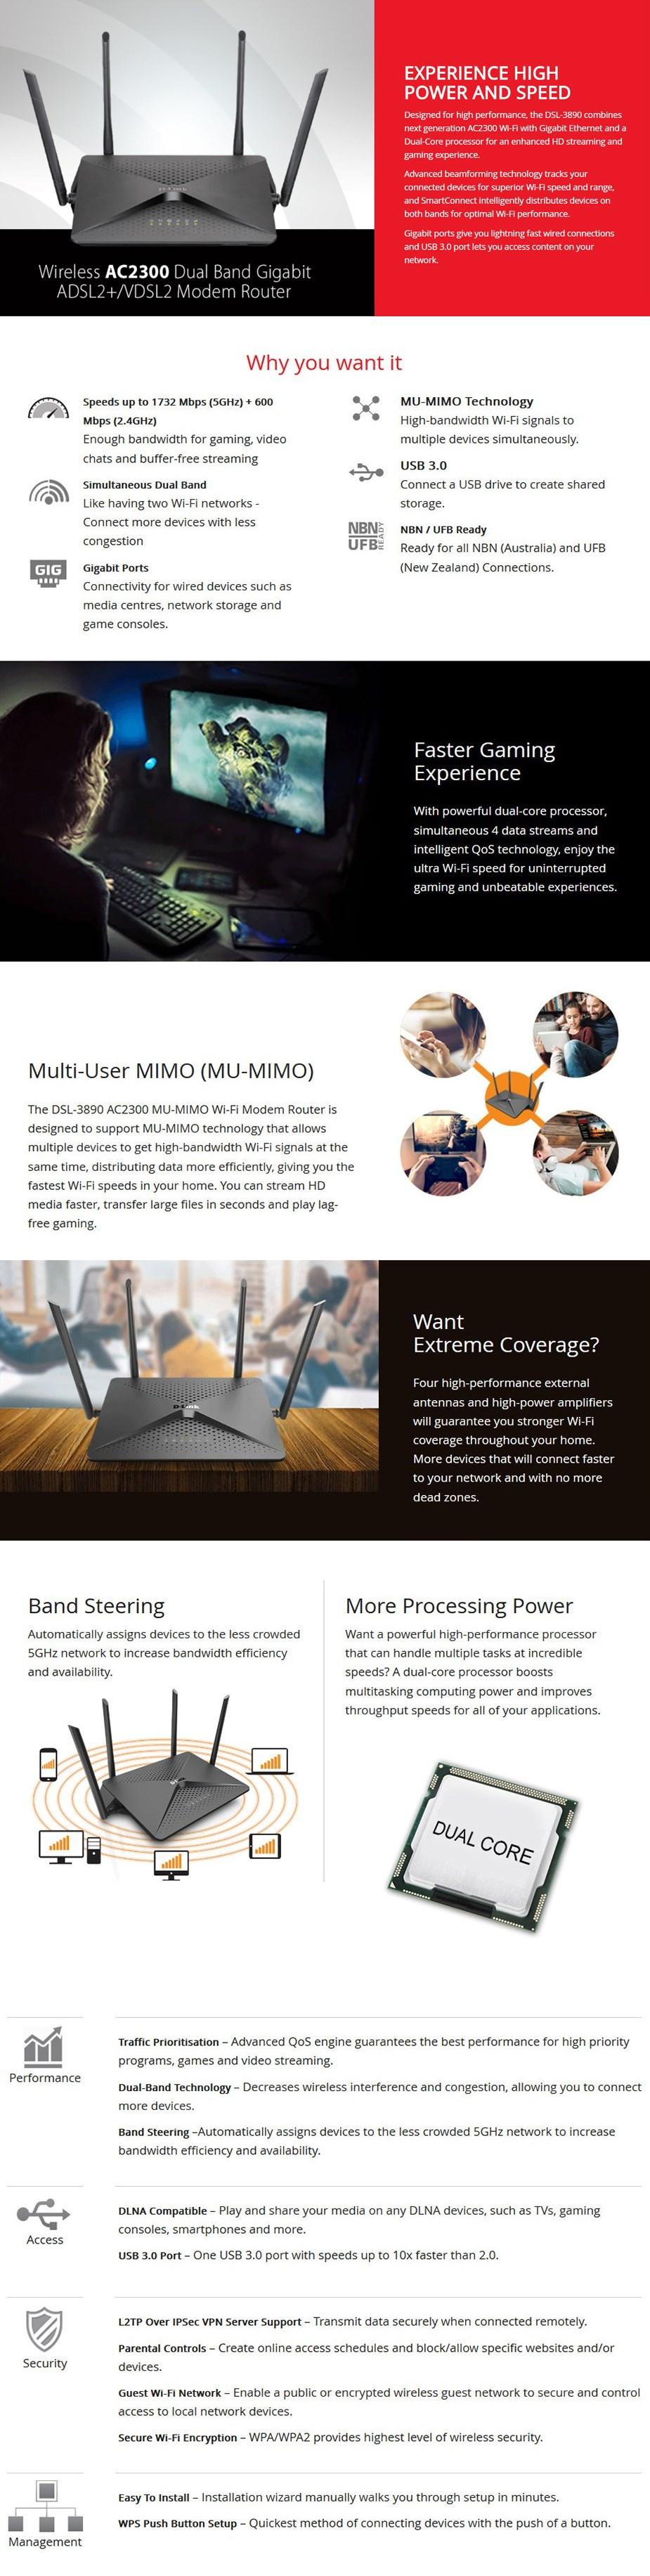 D-Link DSL-3890 AC2300 Dual-Band MU-MIMO DSL2/ADSL2+ Modem Router - Desktop Overview 1